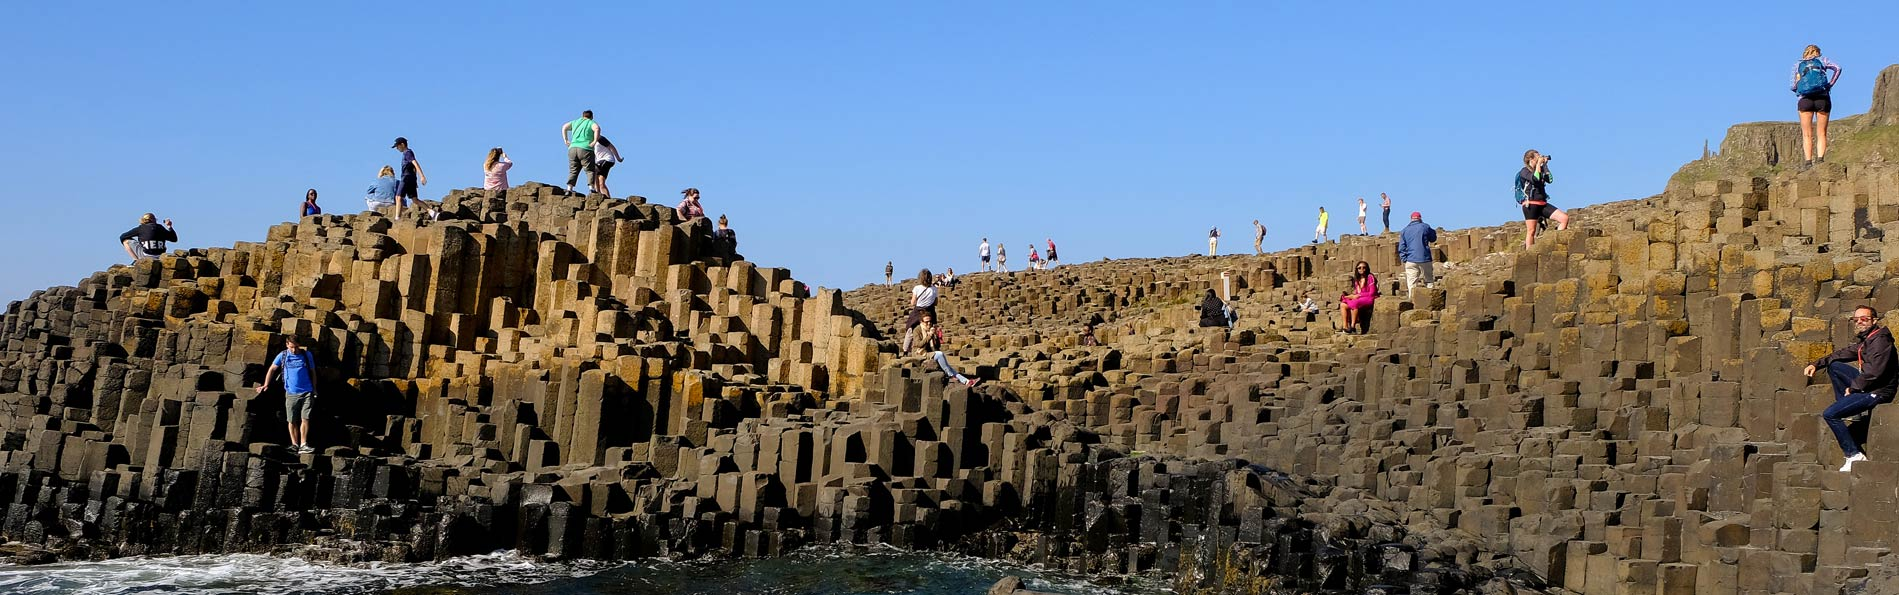 Viajar a Irlanda, consejos e información práctica